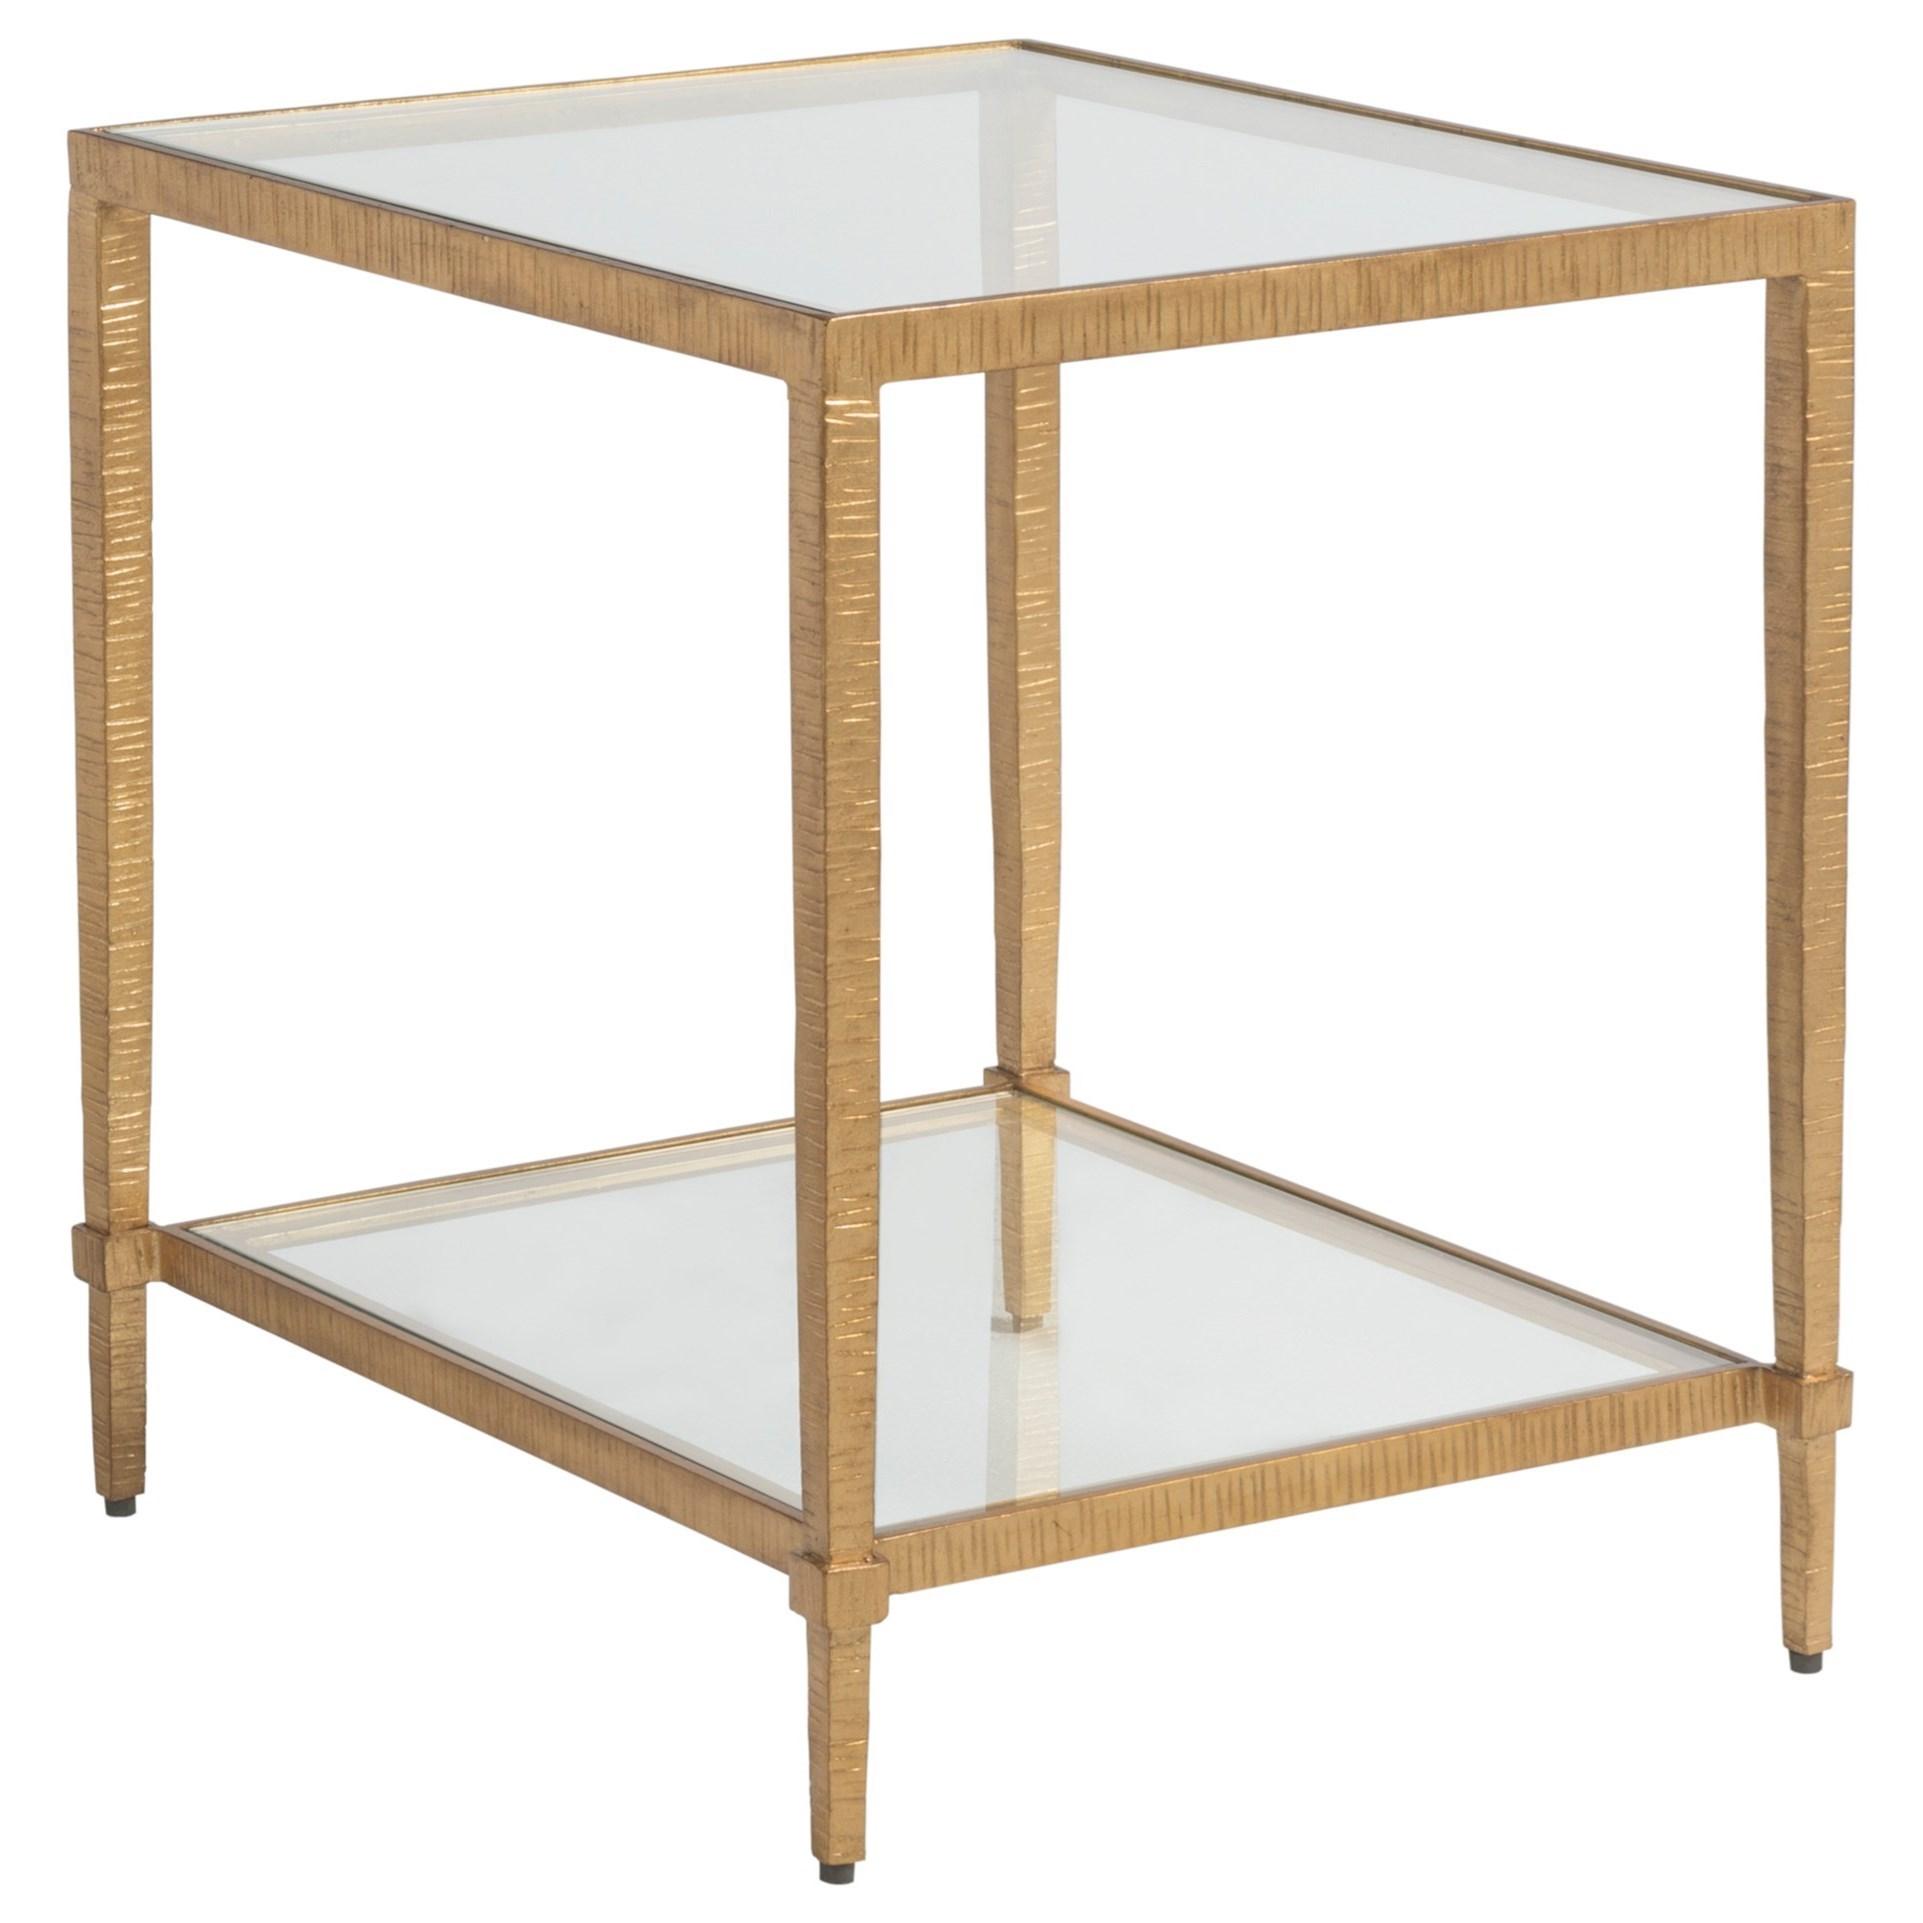 Metal Designs Claret Rectangular End Table by Artistica at Baer's Furniture